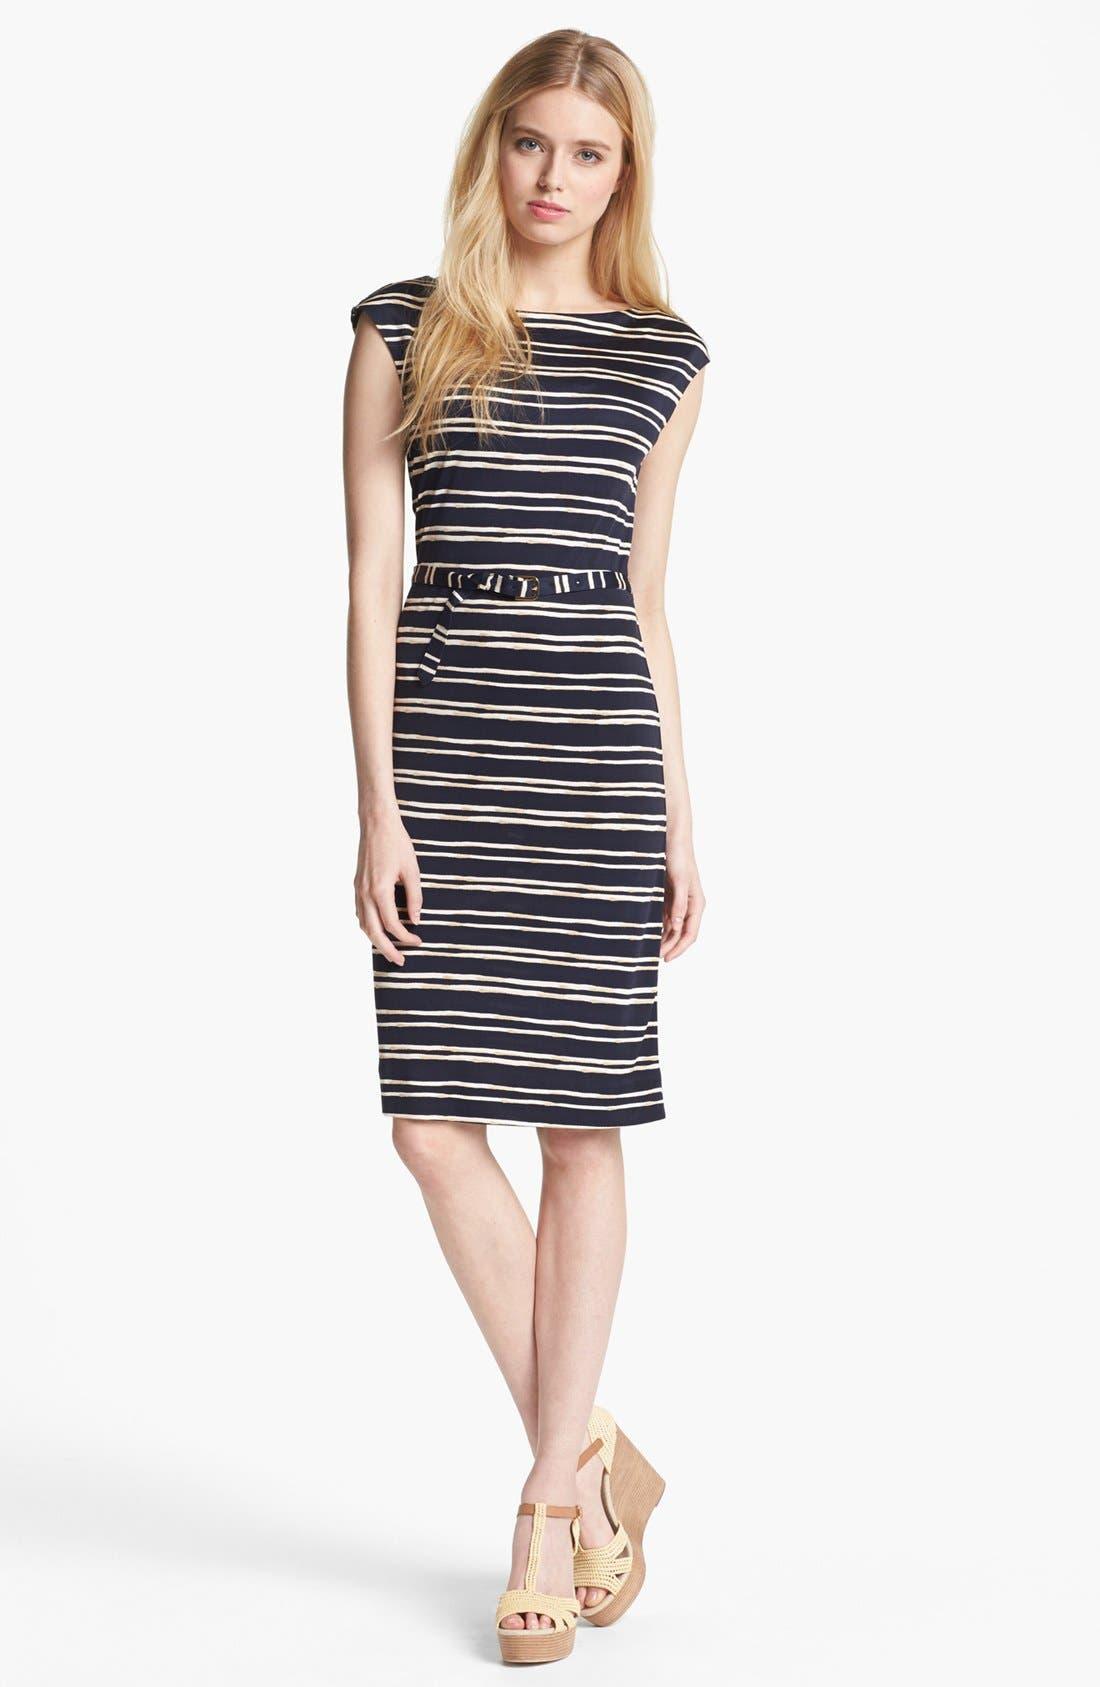 Alternate Image 1 Selected - Tory Burch 'Kalvin' Belted Silk Shift Dress